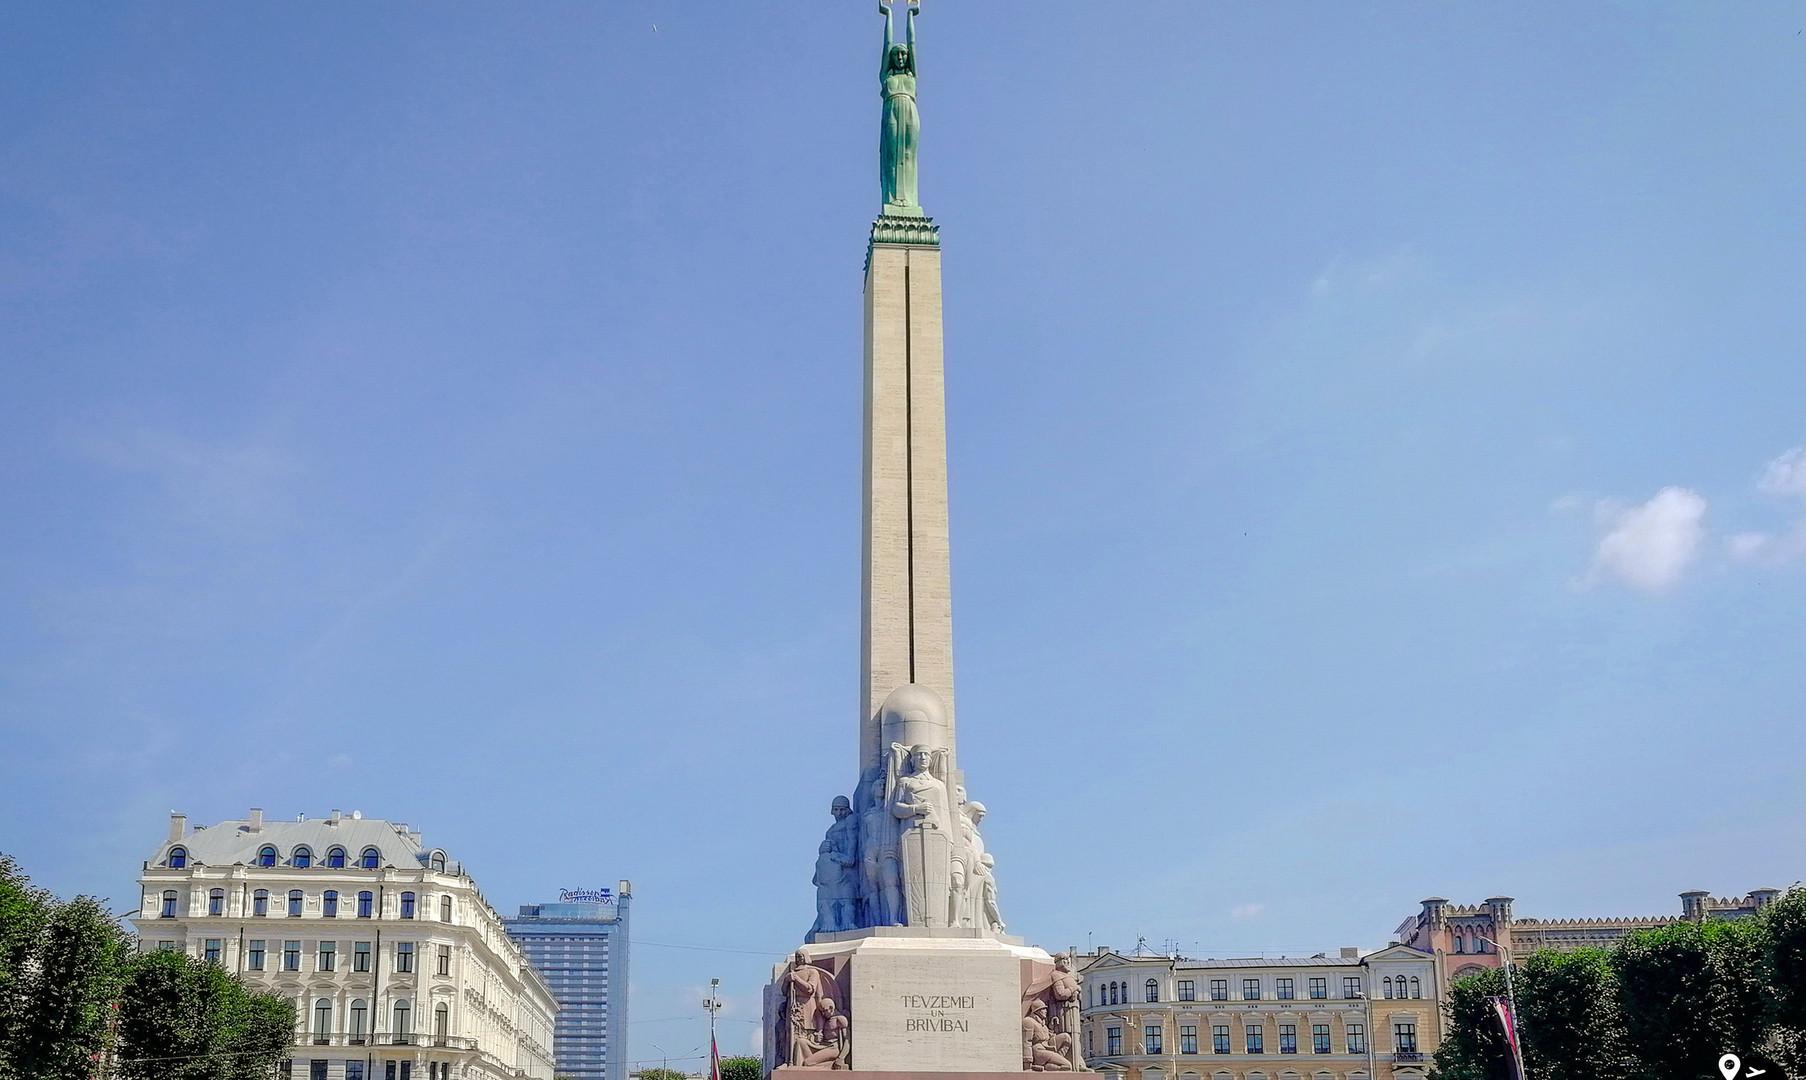 Памятник Свободы, Рига